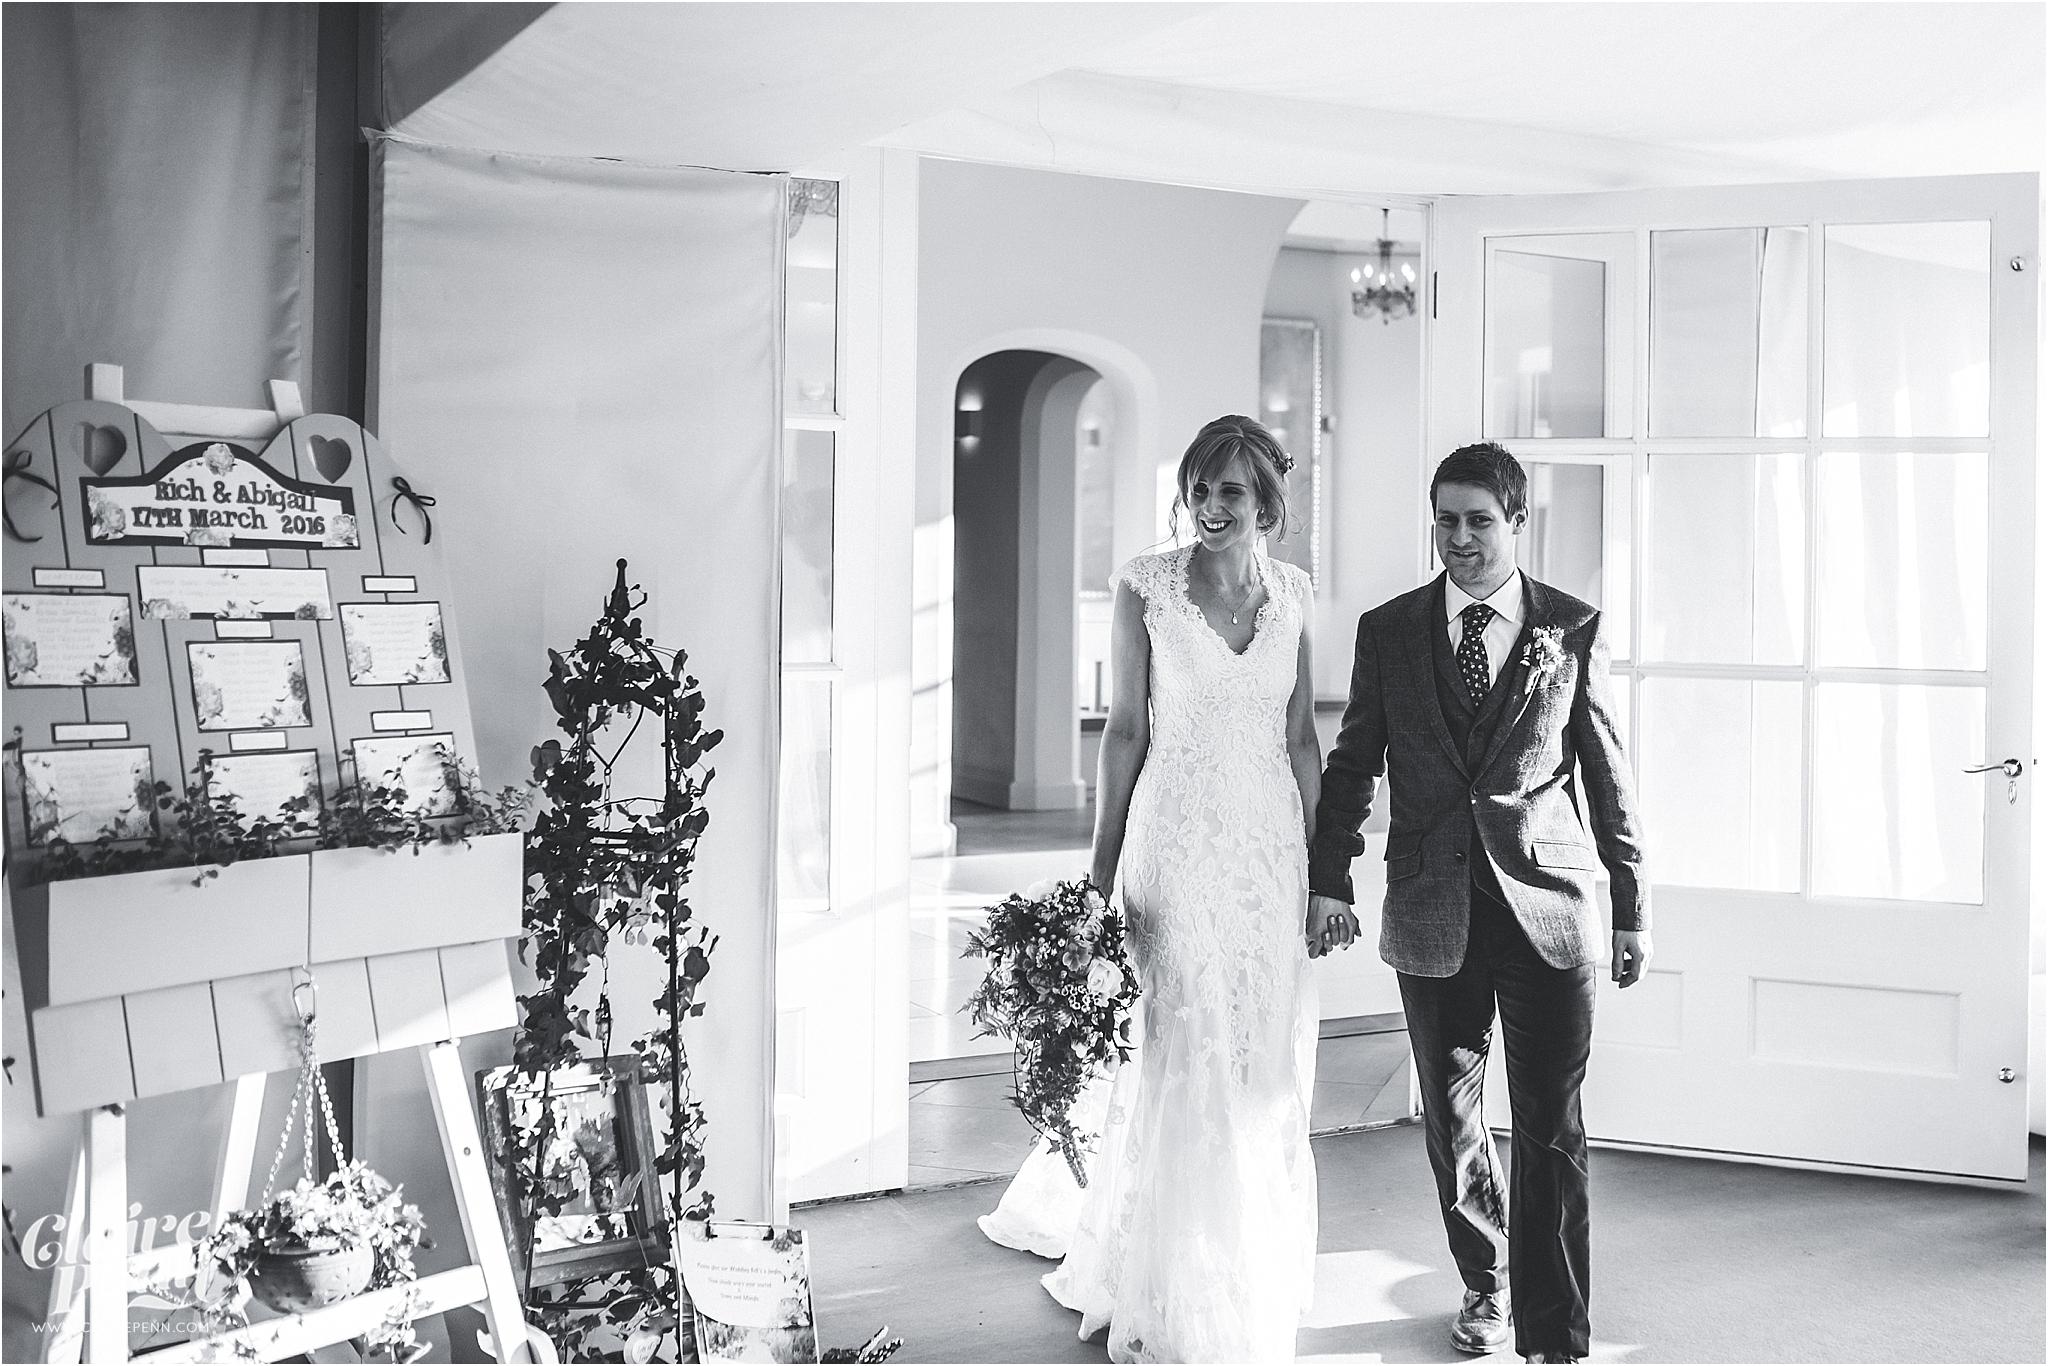 Iscoyd Park wedding, Whitchurch, Cheshire wedding photographer_0050.jpg